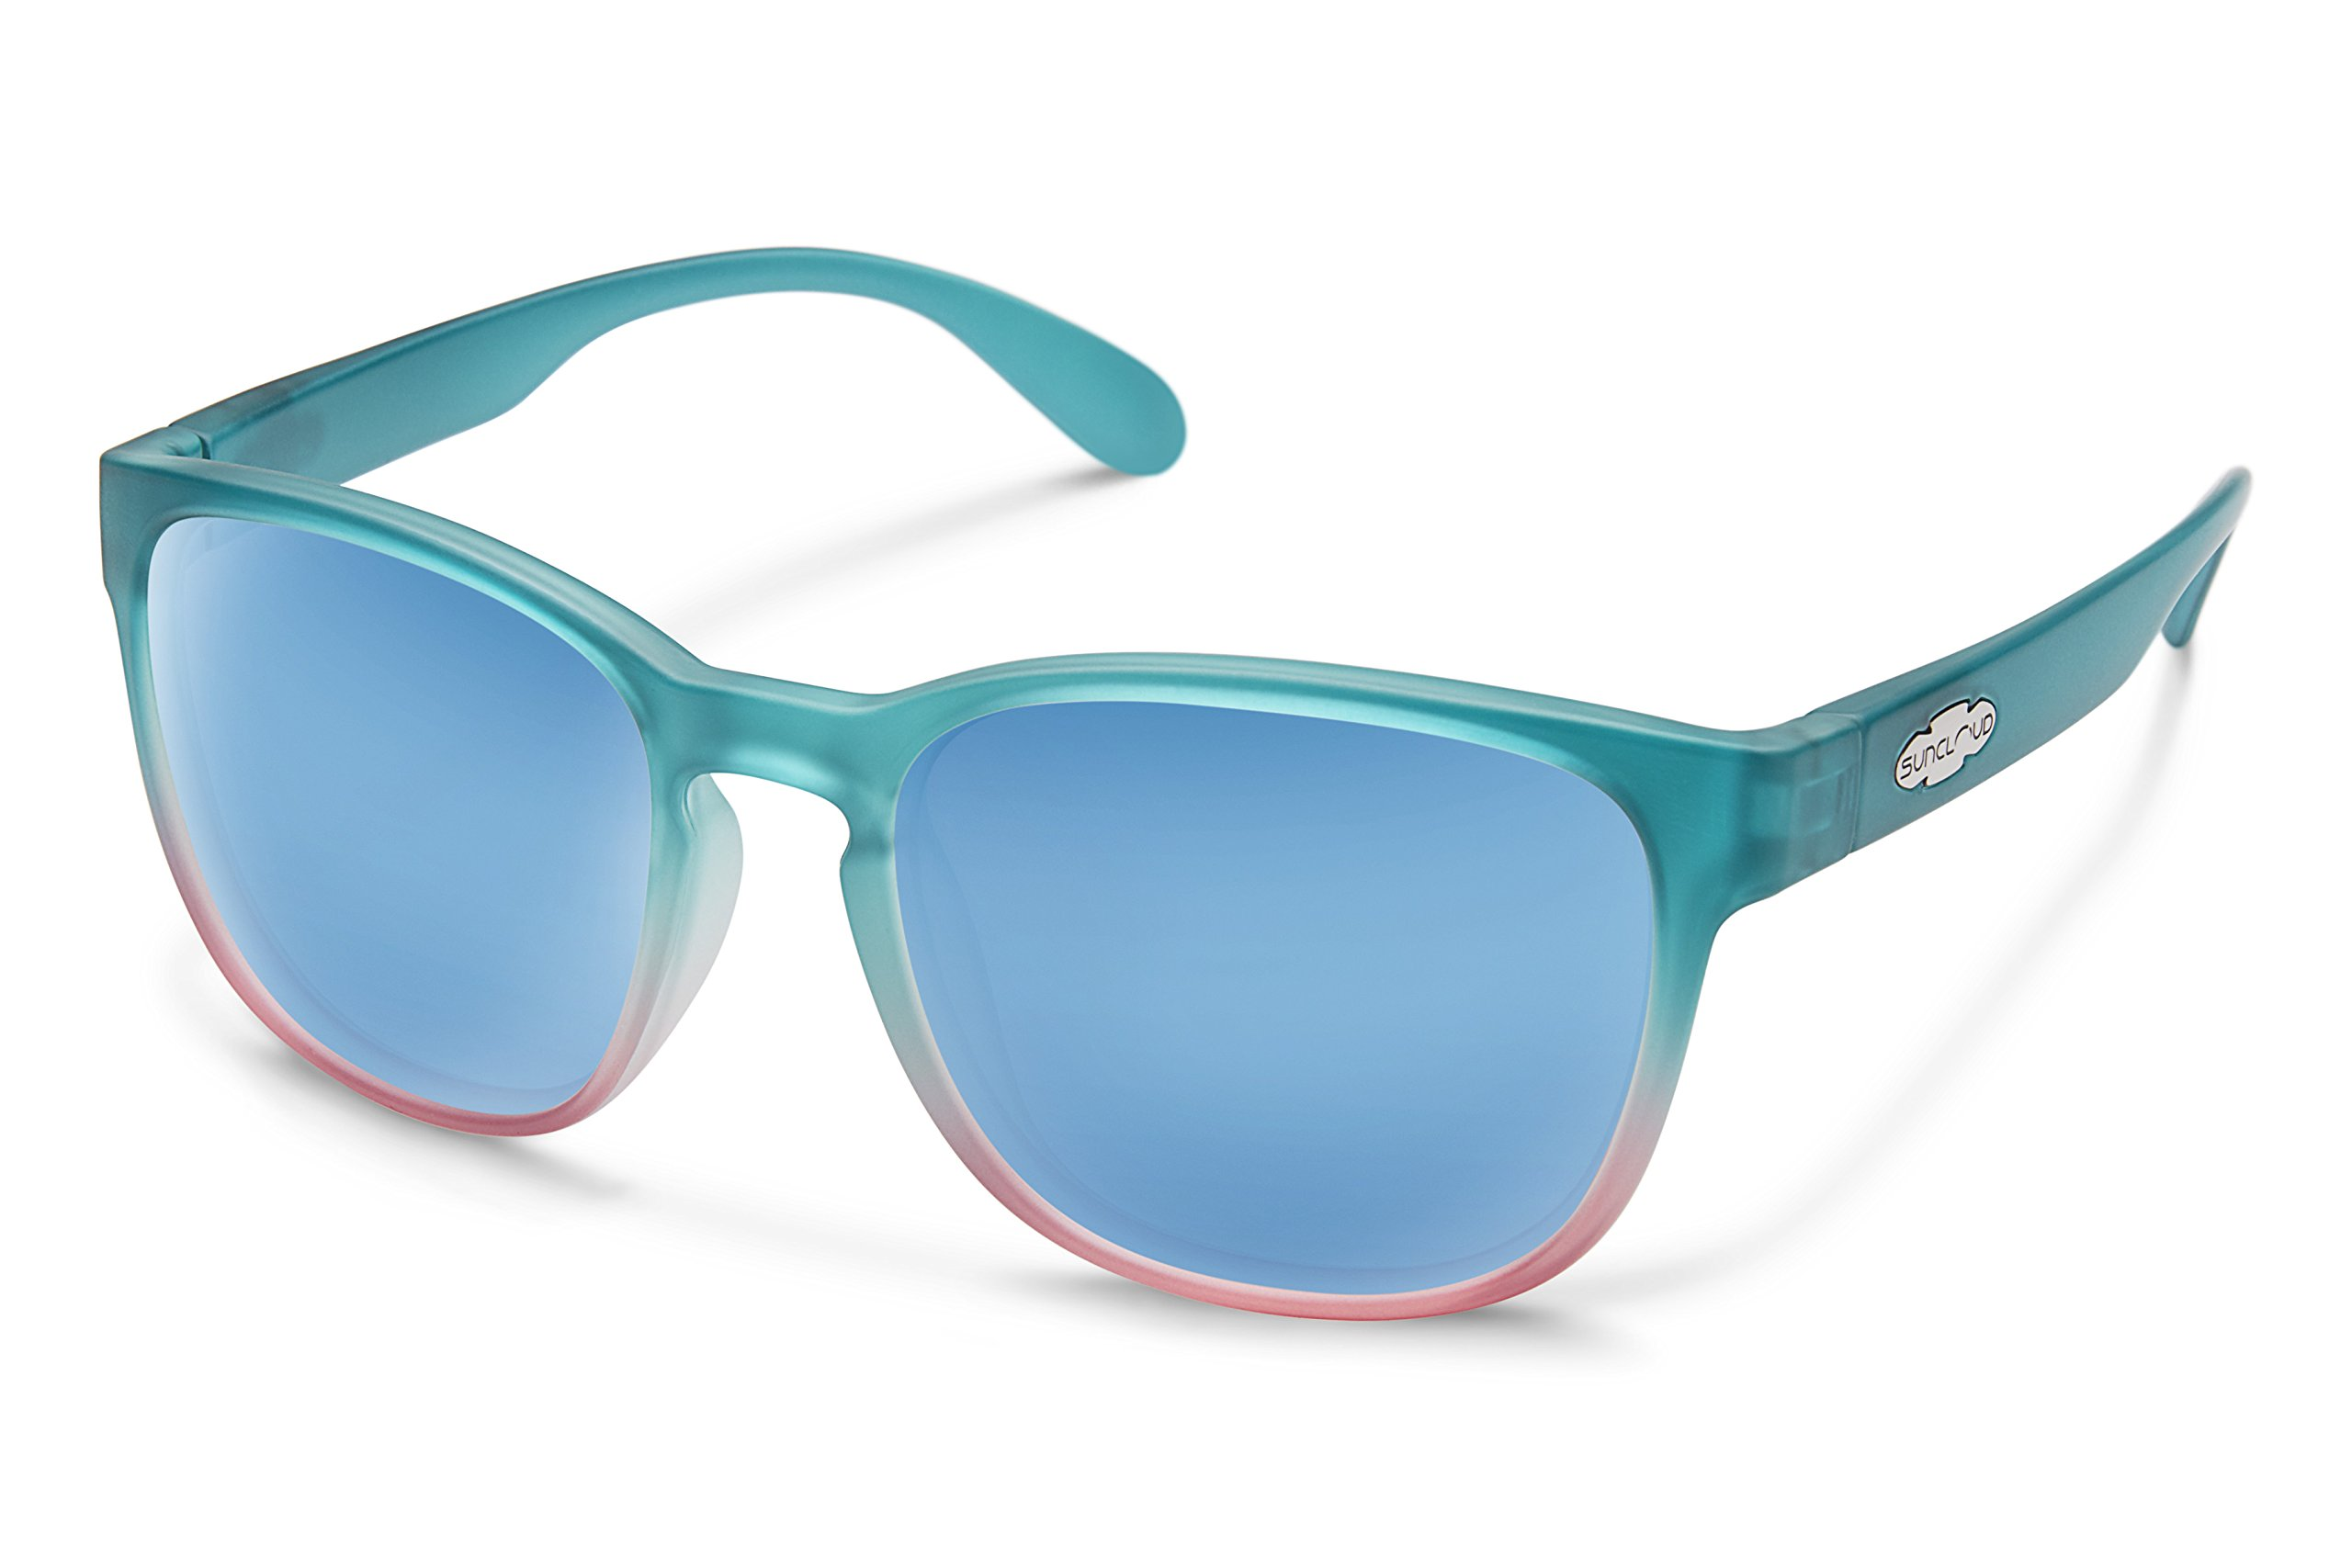 Suncloud Loveseat Sunglasses, Aqua Pink Fade Frame/Blue Mirror Polycarbonate Lens, One Size